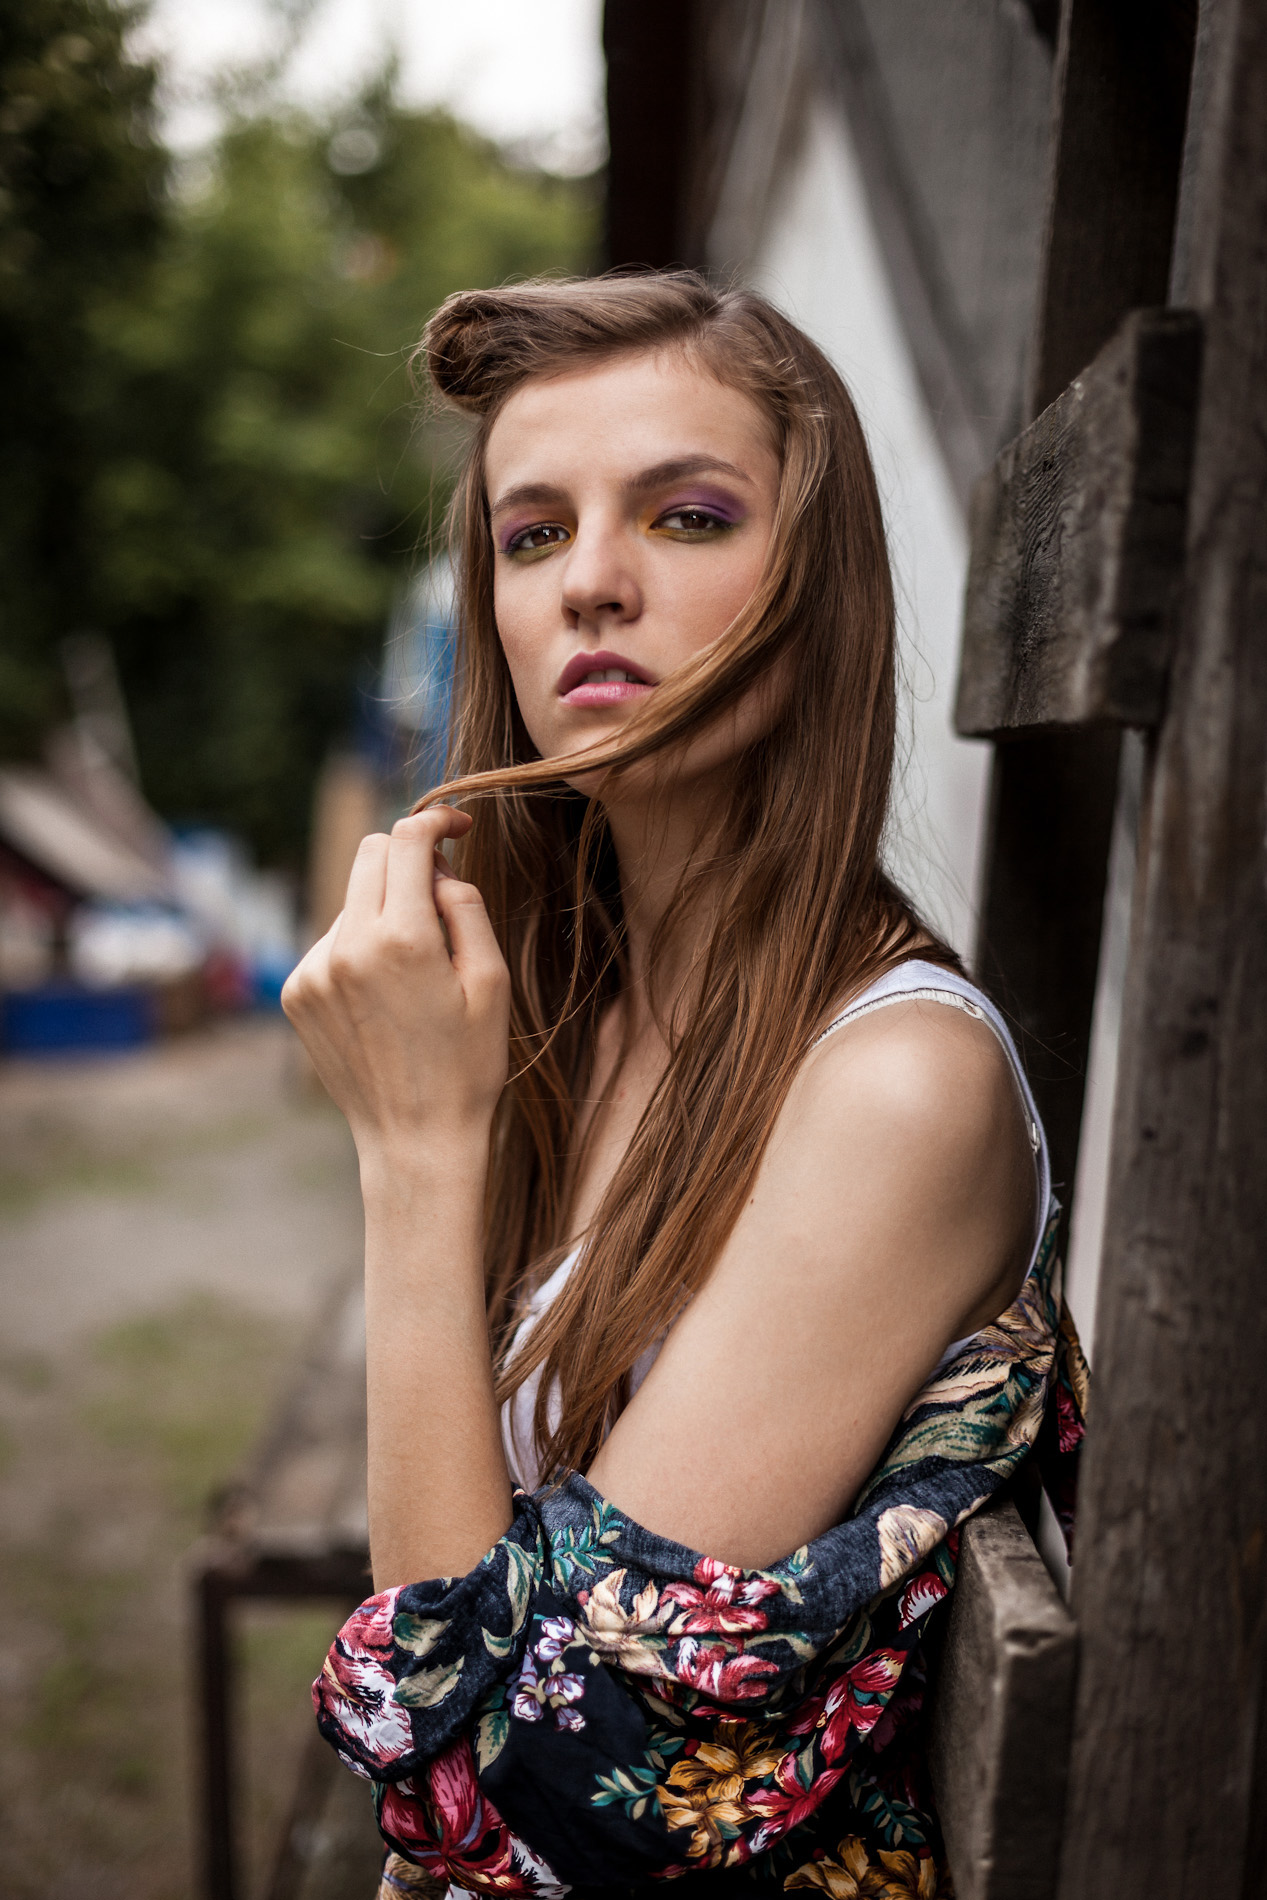 Sesja_Wizerunkowa_Outdoor_03